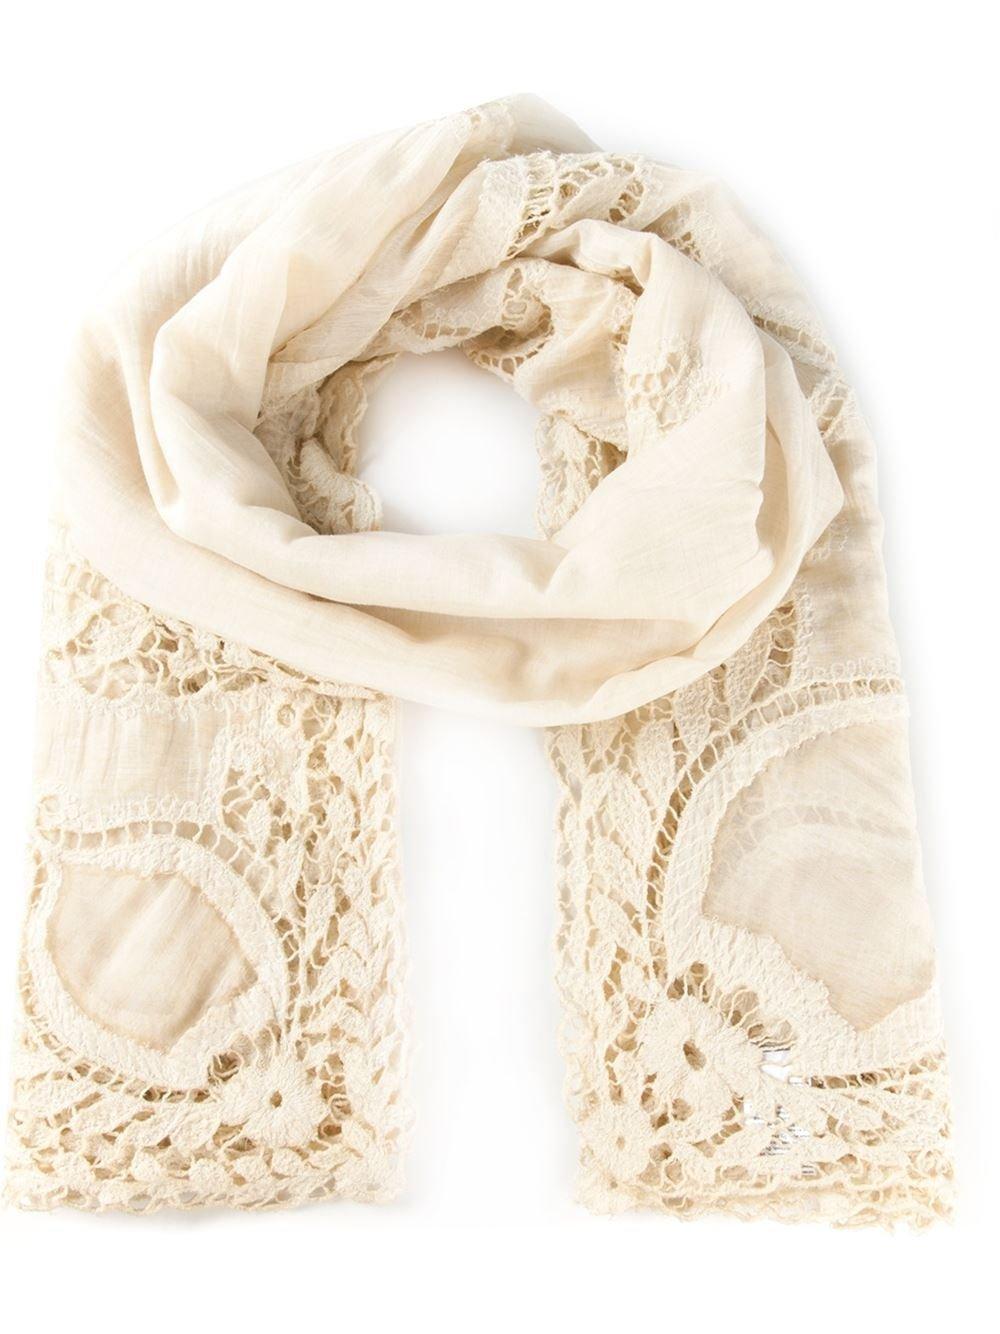 embroidered borderscarf - Nude & Neutrals Faliero Sarti xKeZsP6SCS